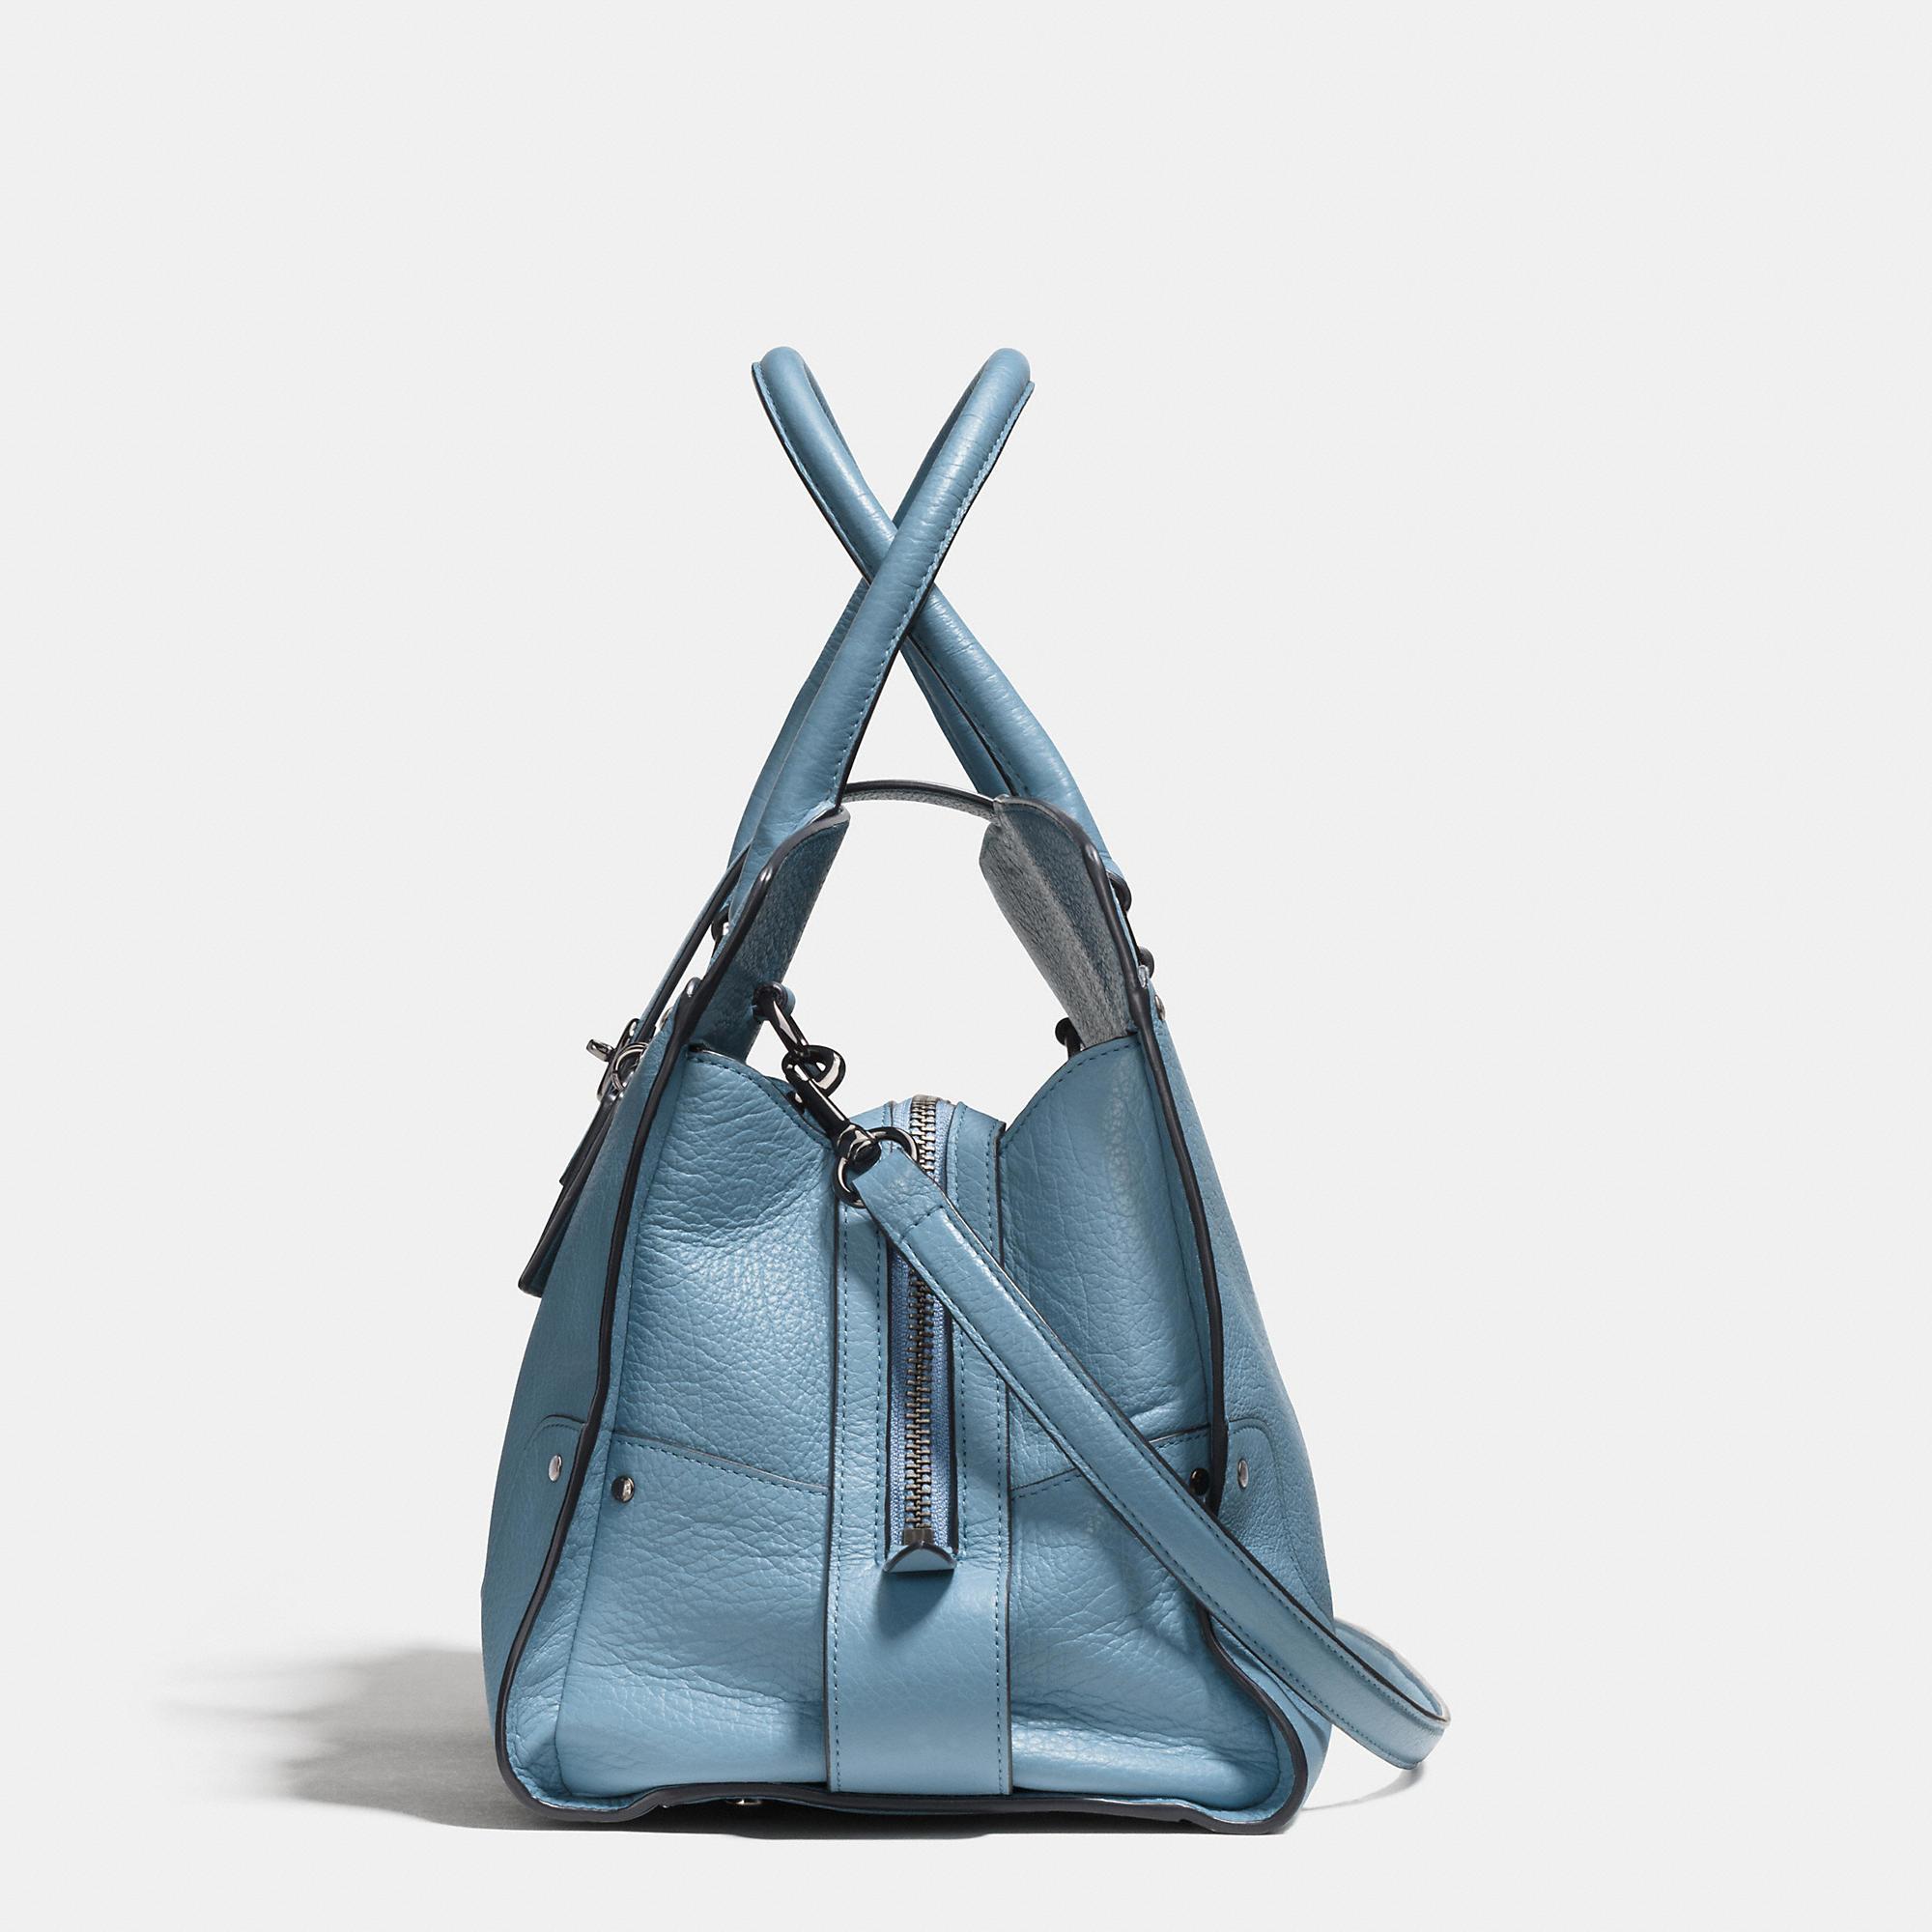 ... shopping lyst coach mercer satchel in grain leather a2275 c13eb 84f91f873680e